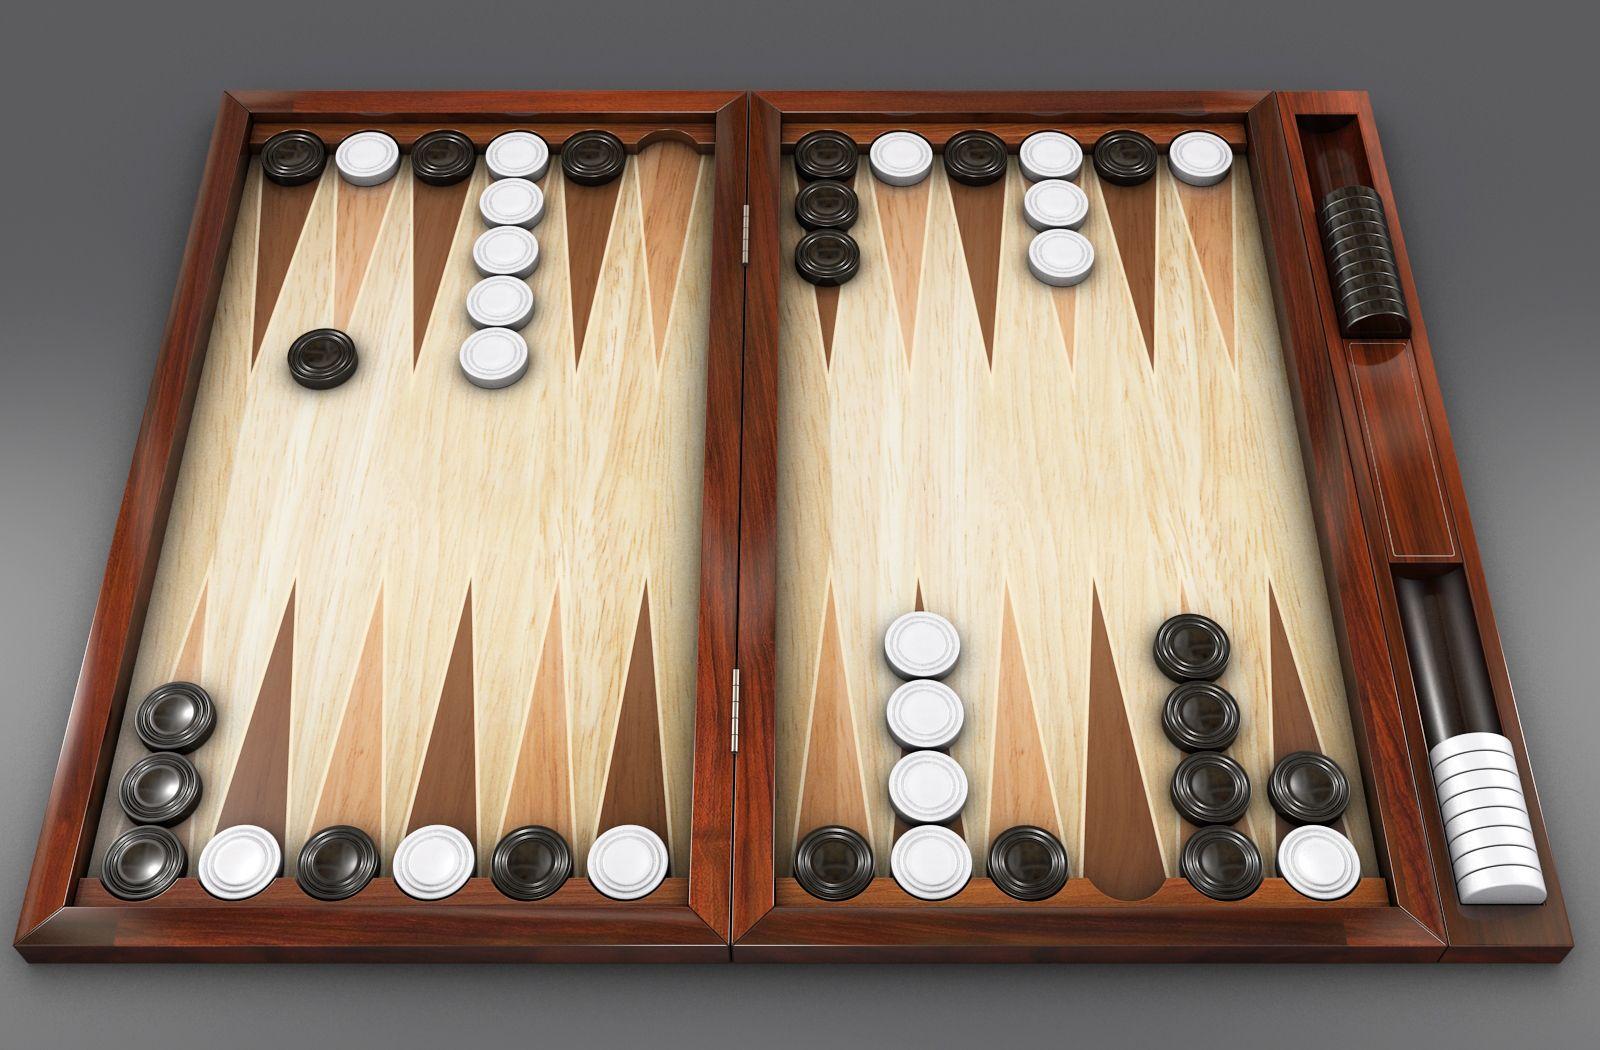 backgammon Backgammon, Texture, Home